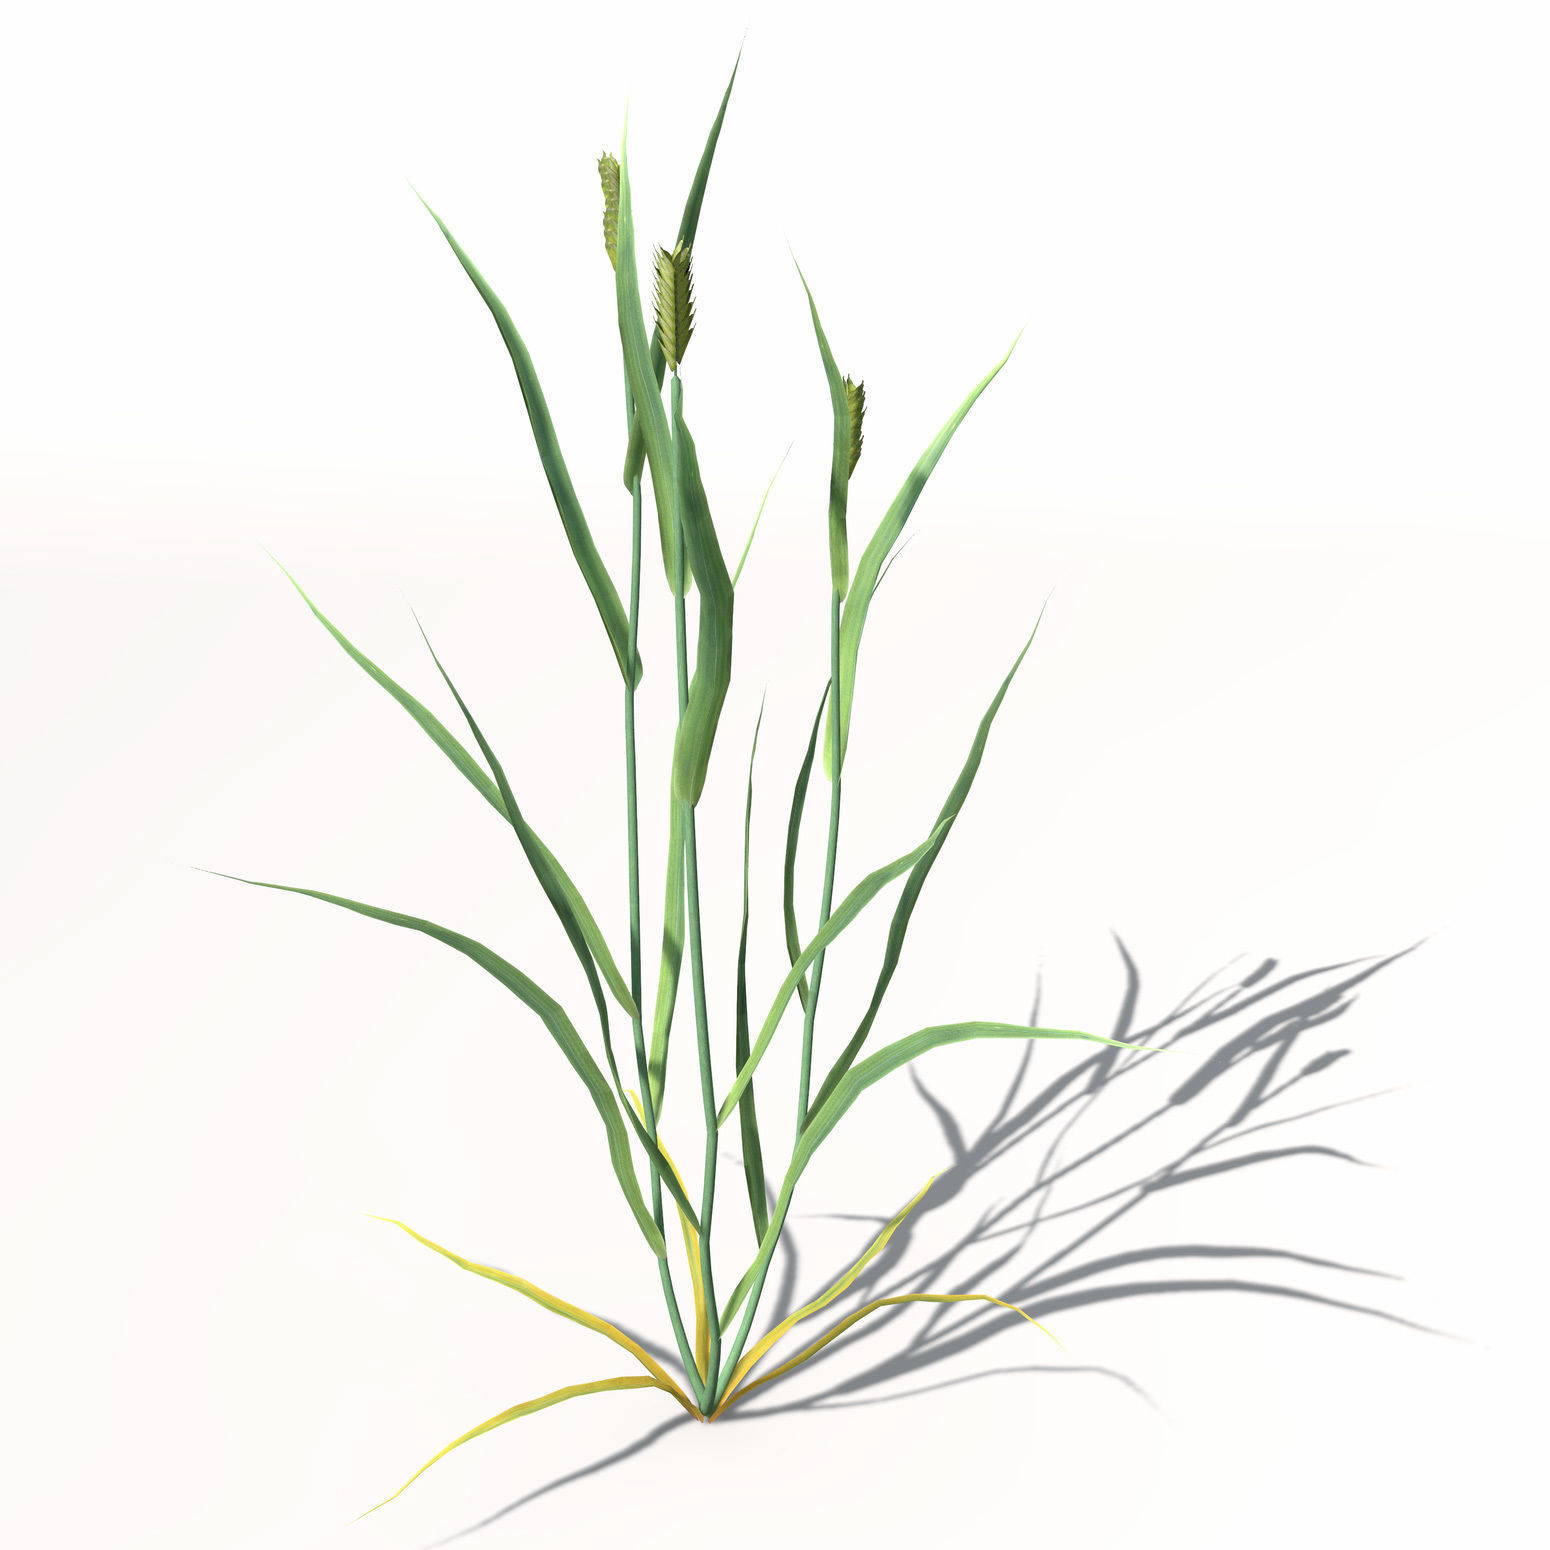 1550x1550 Xfrogplants Wheat 3d Model Cgtrader